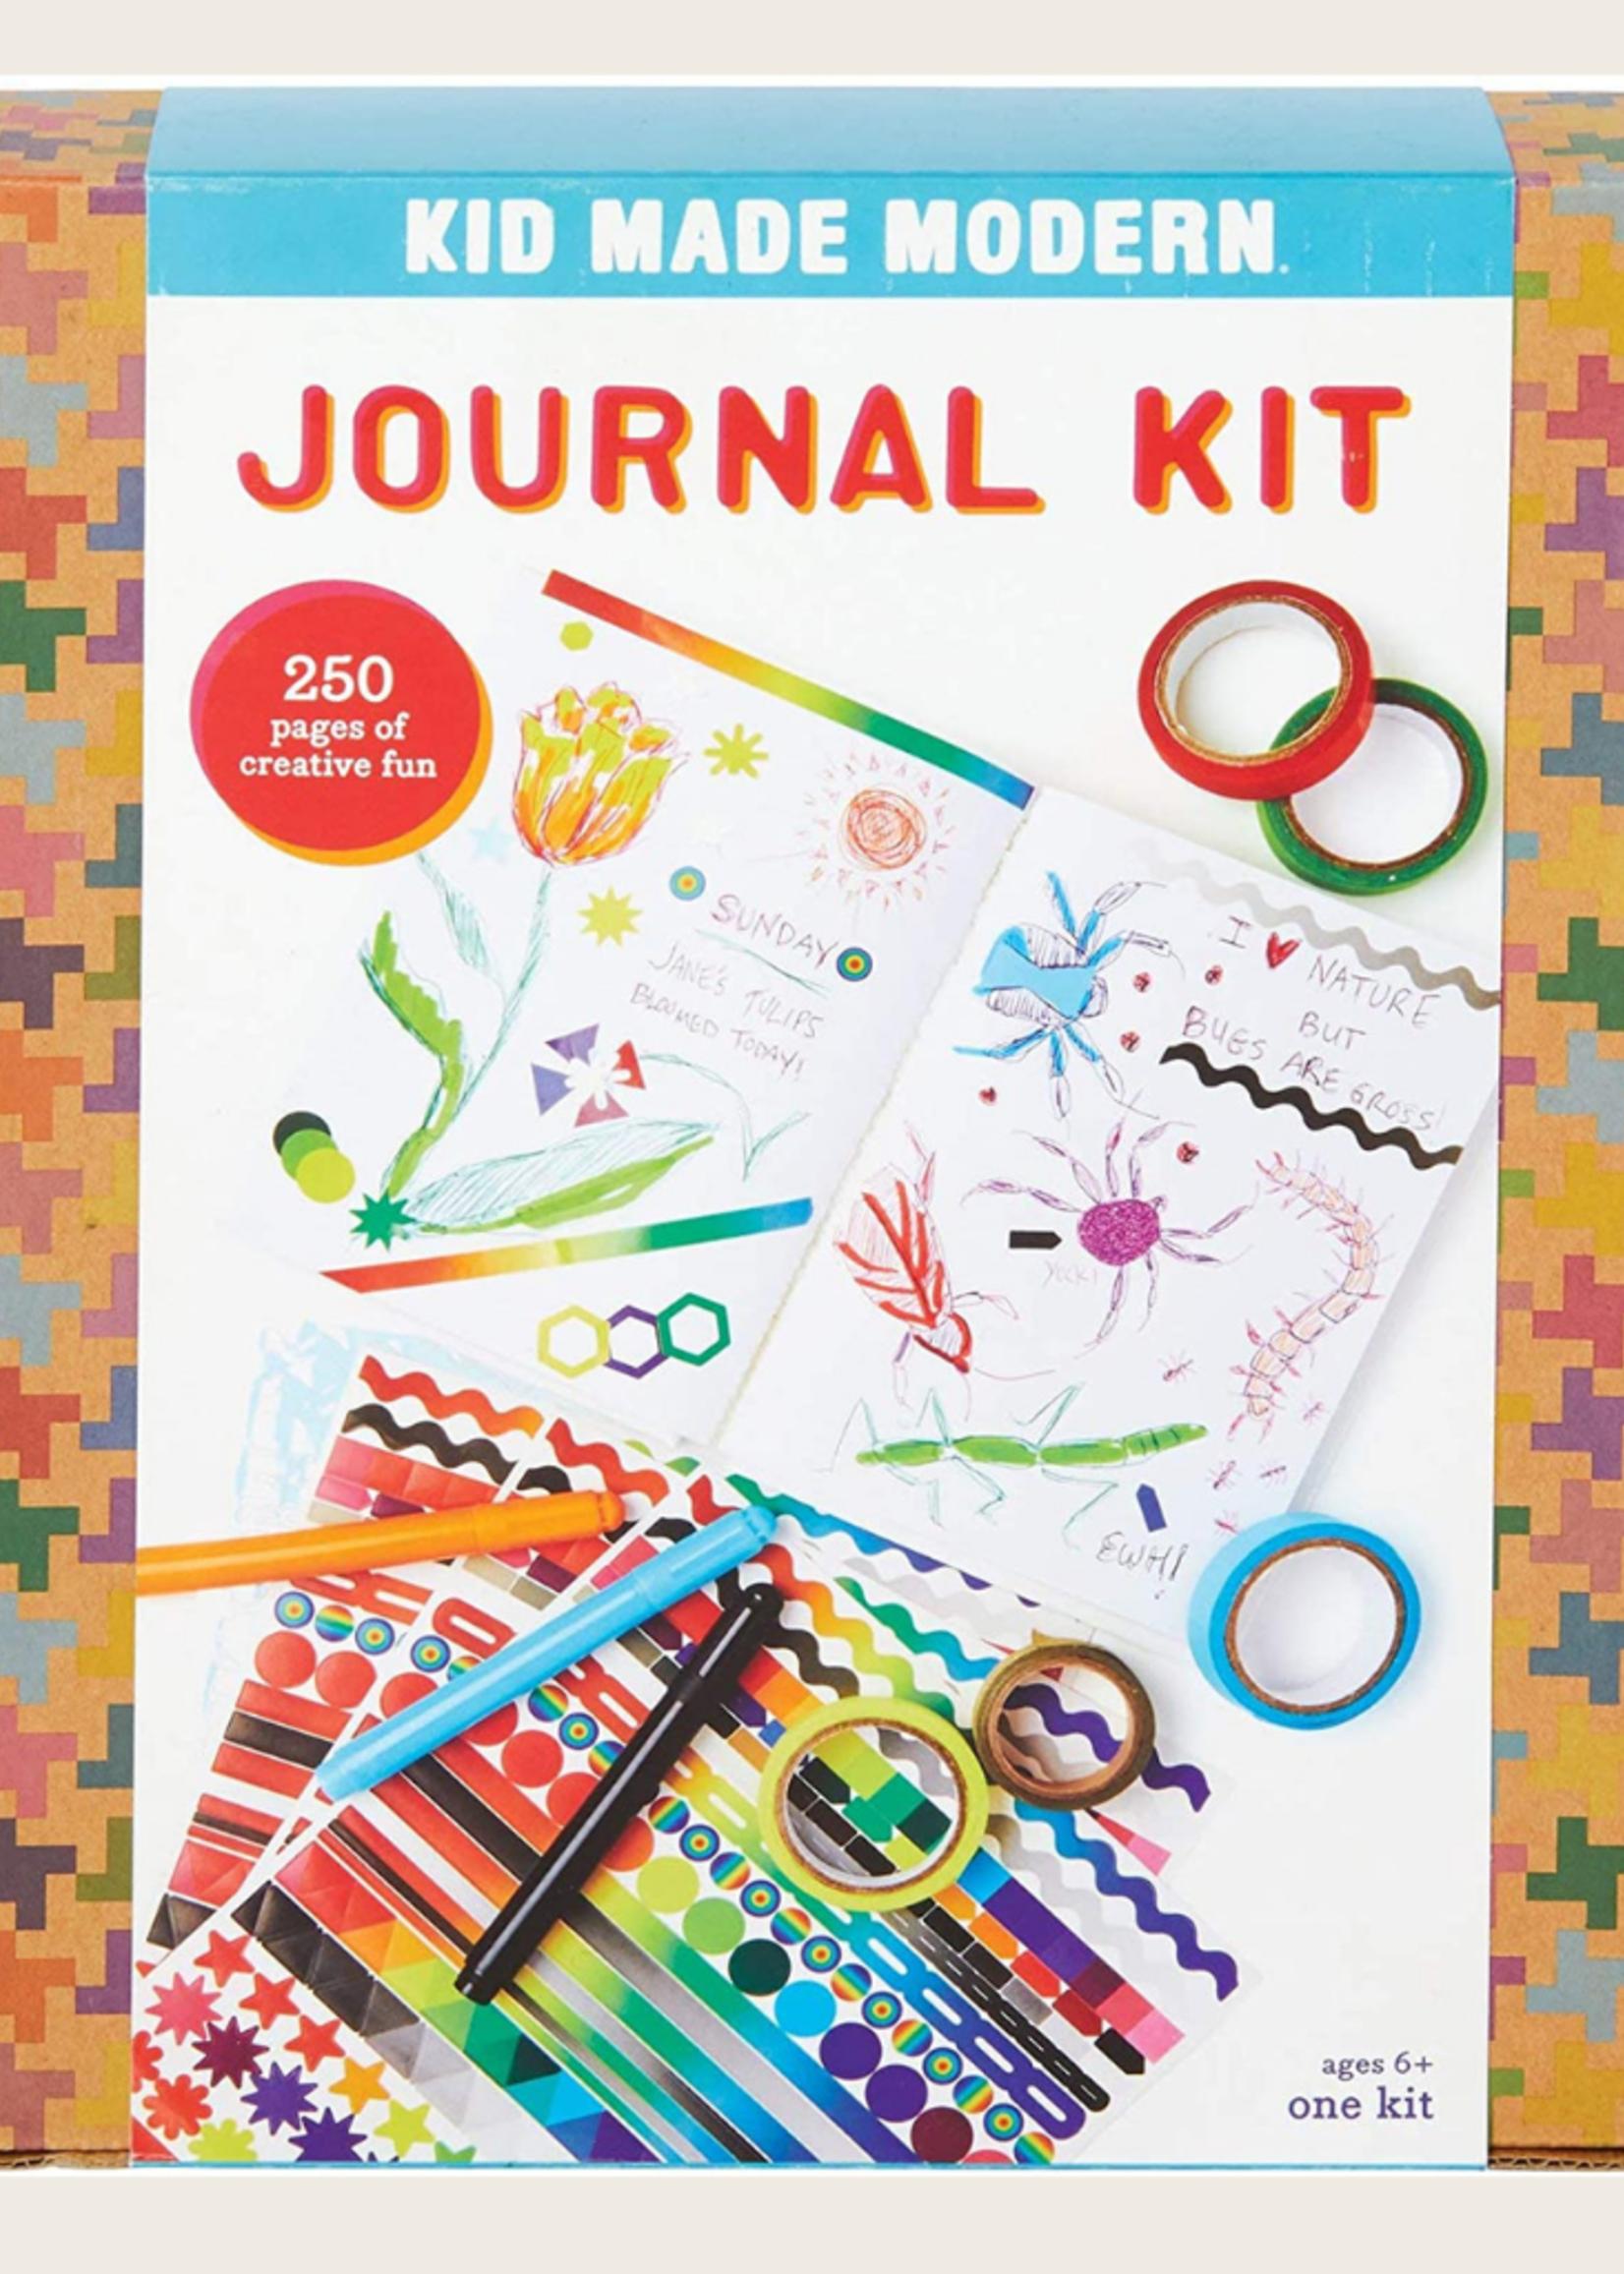 Kids Made Modern Kid Made Modern Journal Kit